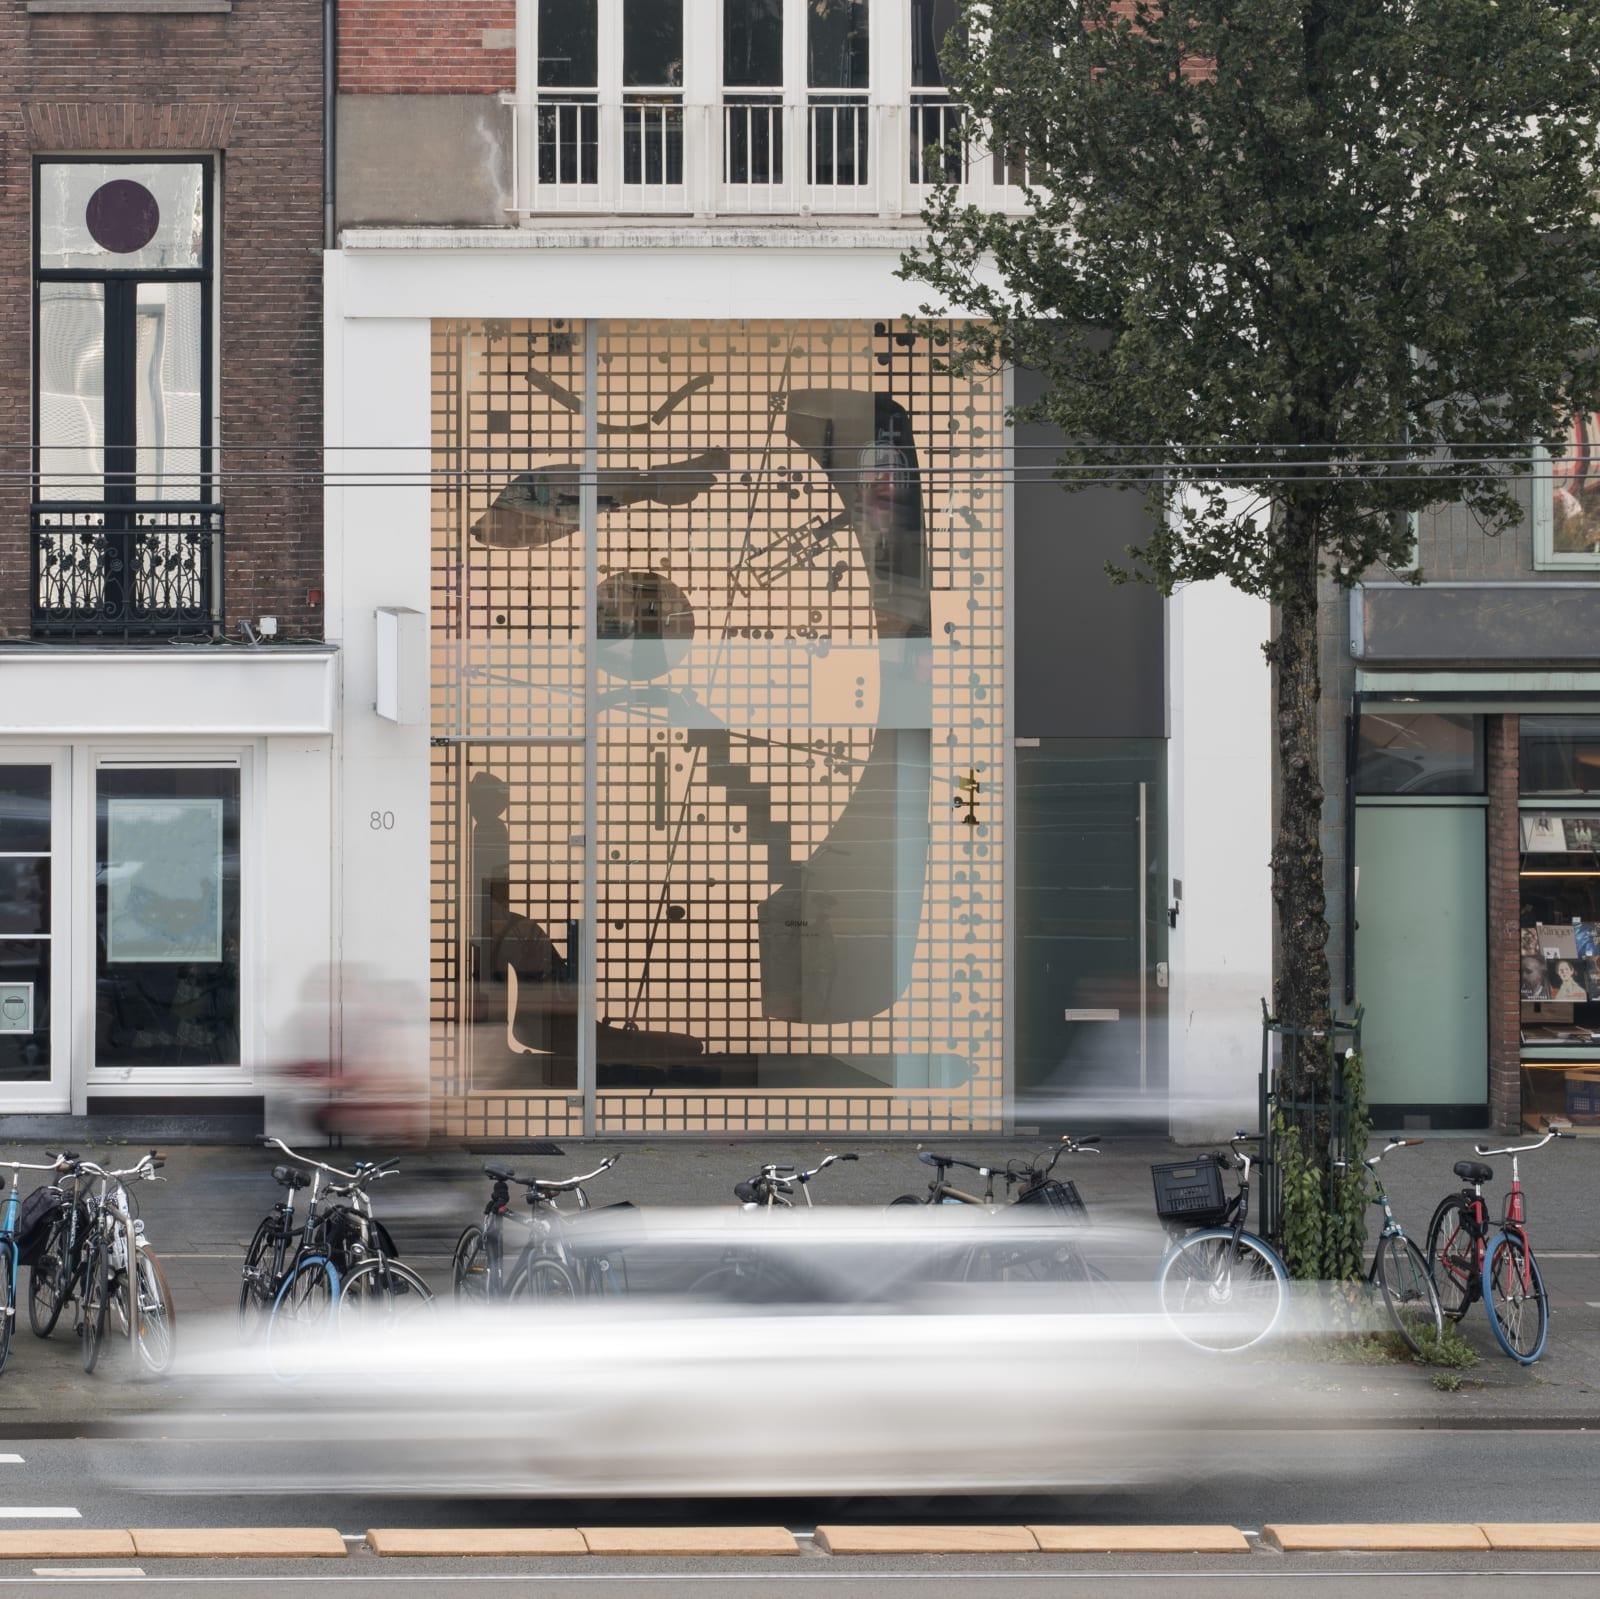 Saskia Noor van Imhoff